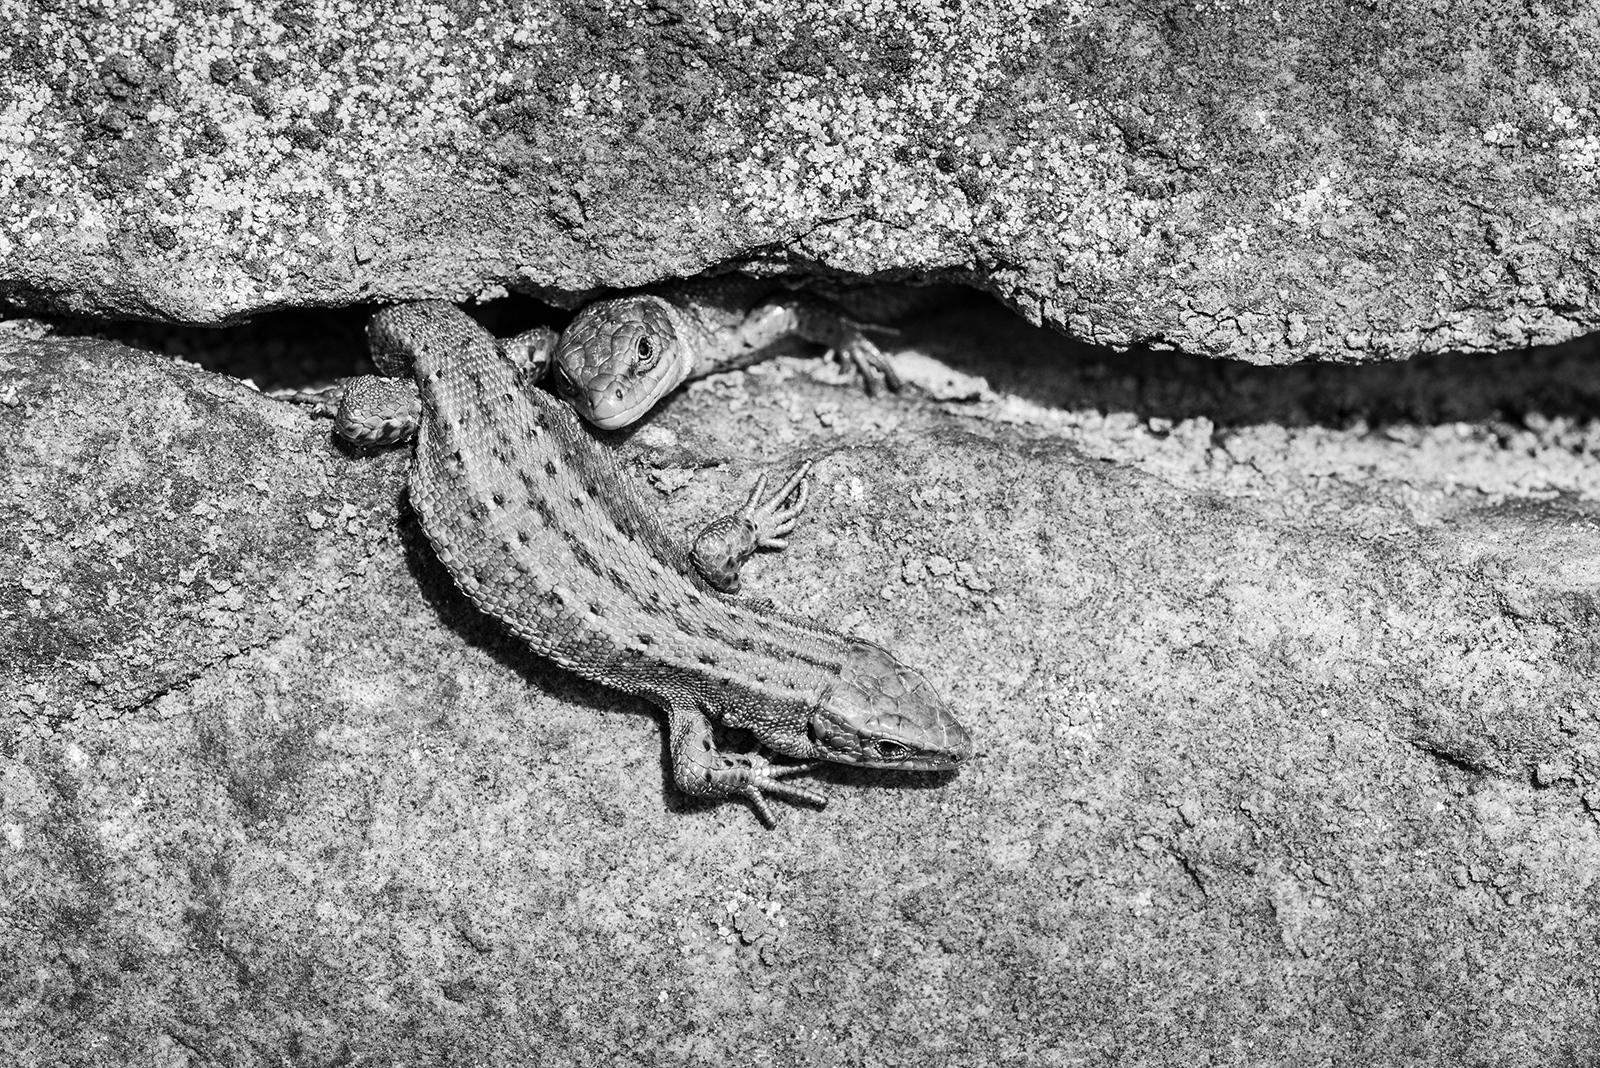 Lizards_by_Sara-Cremer